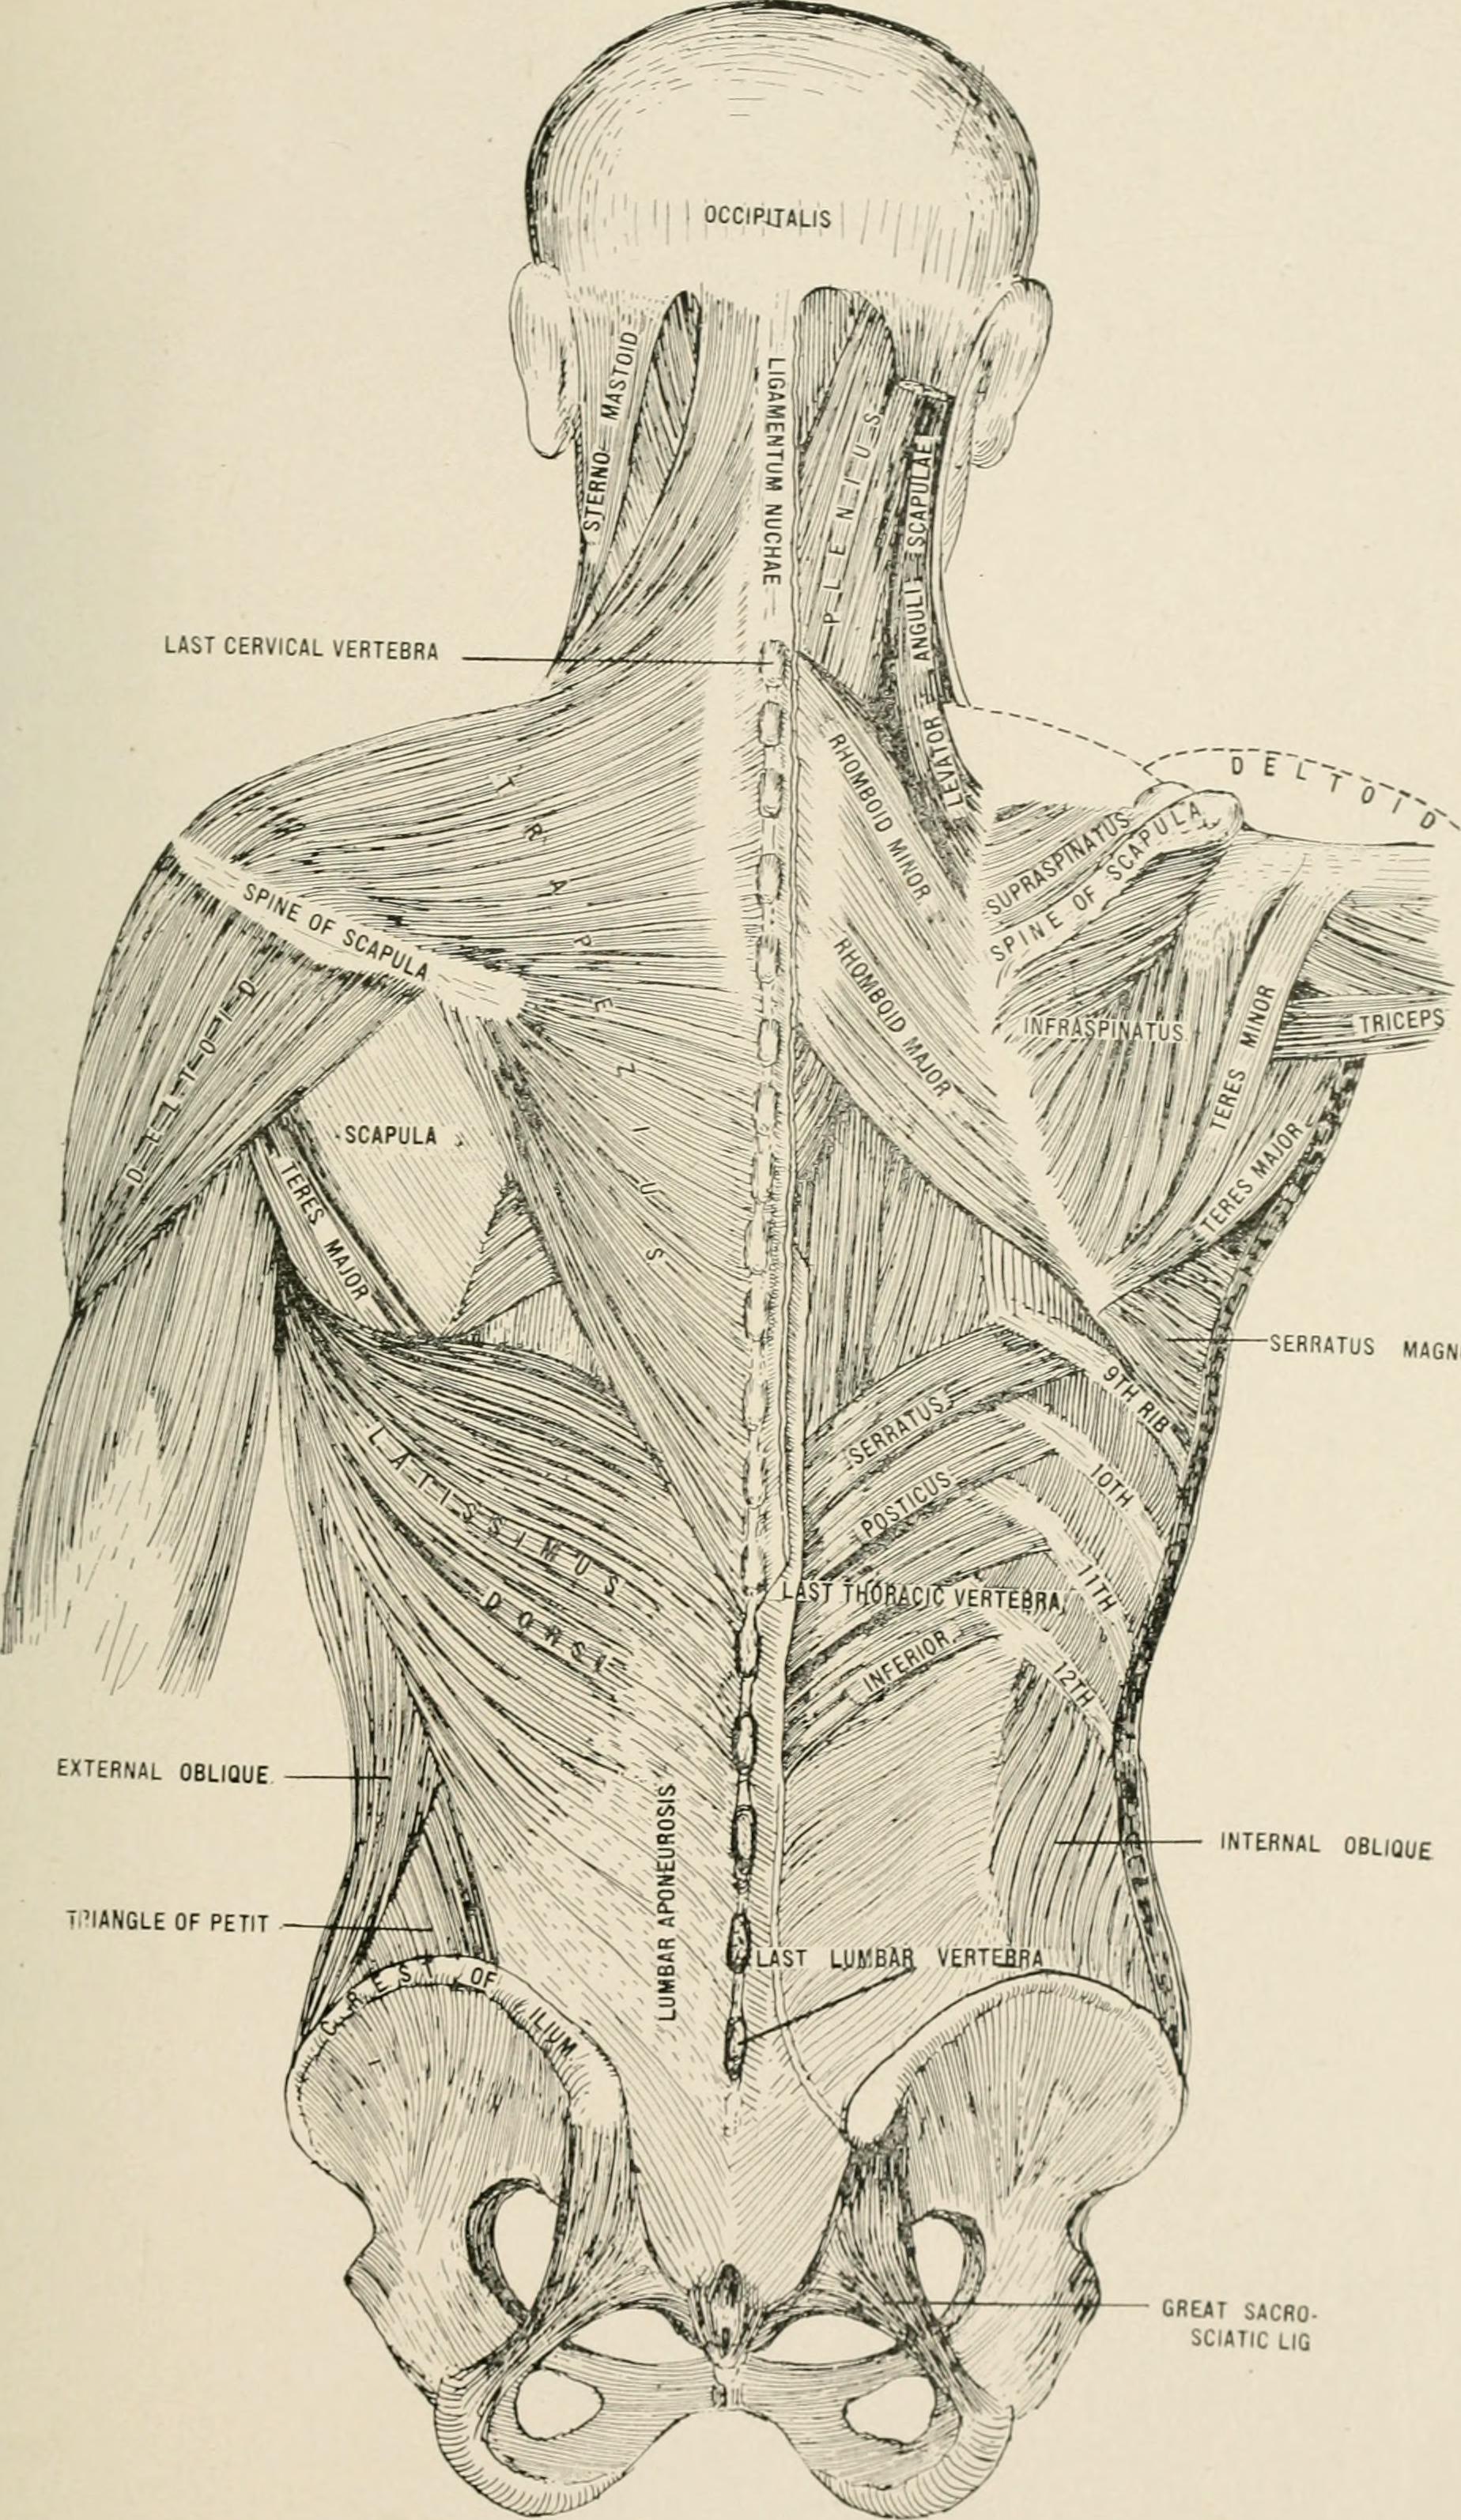 Wunderbar Neue Graue Anatomie Ideen - Anatomie Ideen - finotti.info